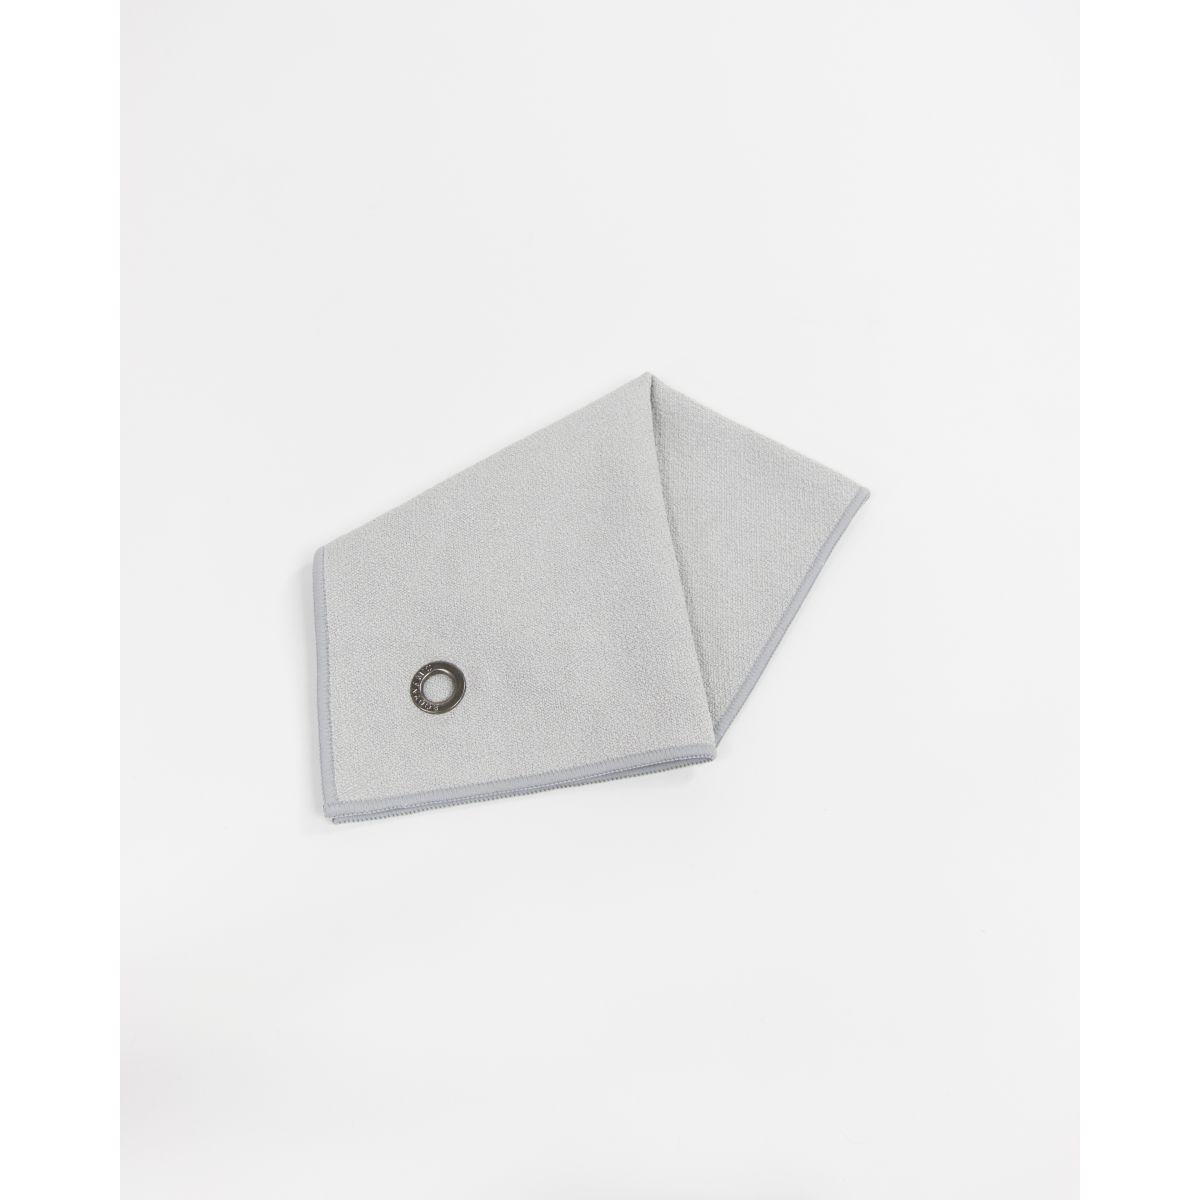 serviette mains visage en microfibre anuanua gris perle bodynamic. Black Bedroom Furniture Sets. Home Design Ideas